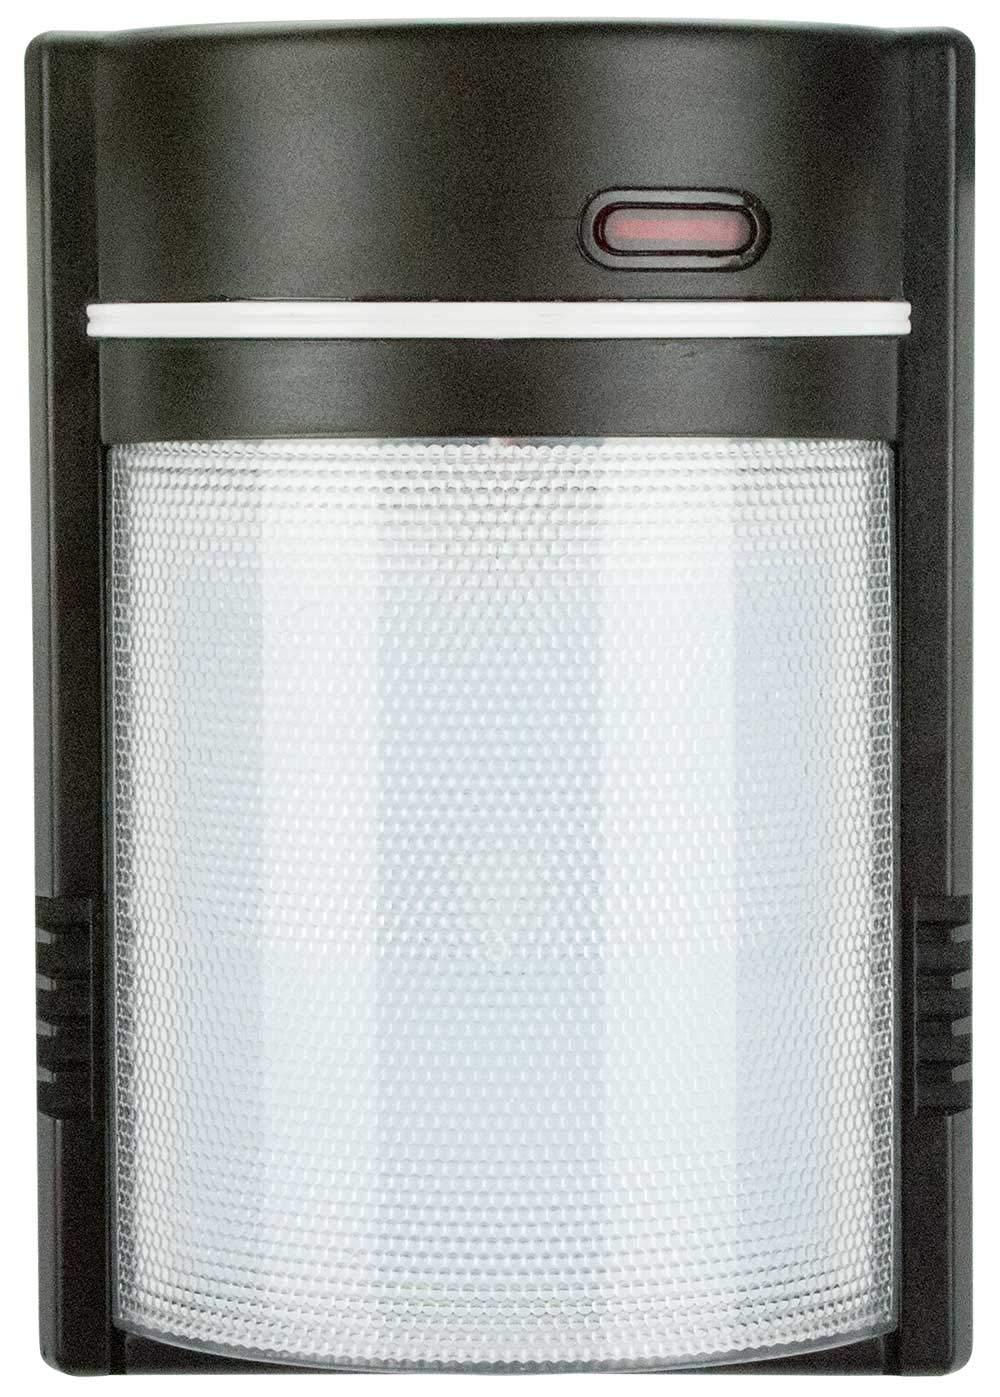 Super Bright White Light Contemporary Light Fixture designre LED Wall Light 19 Watts,5000K Color